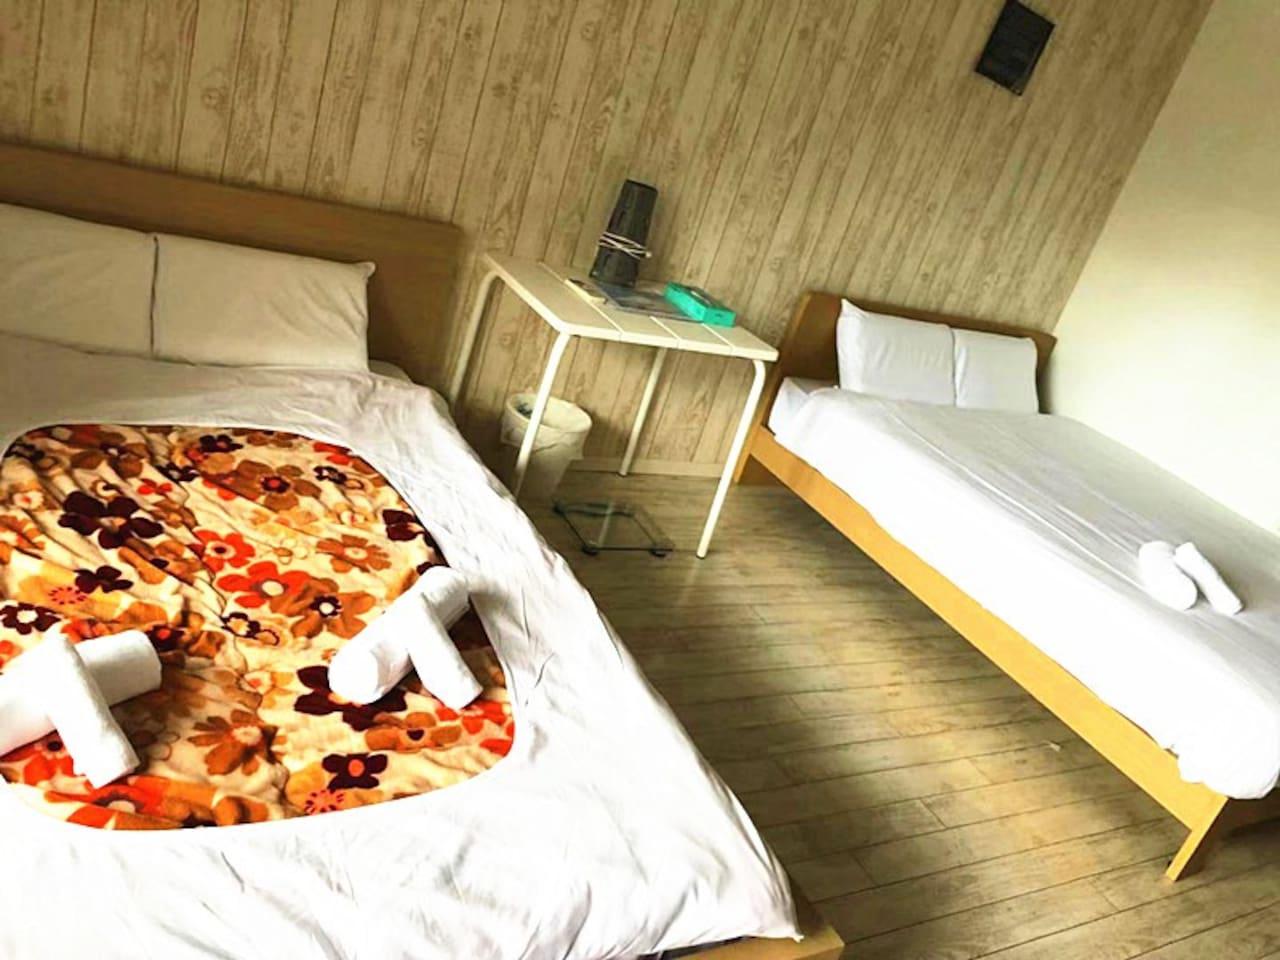 1bedroom with 3SDbeds 一间大卧室3张床 120cmx200cm。